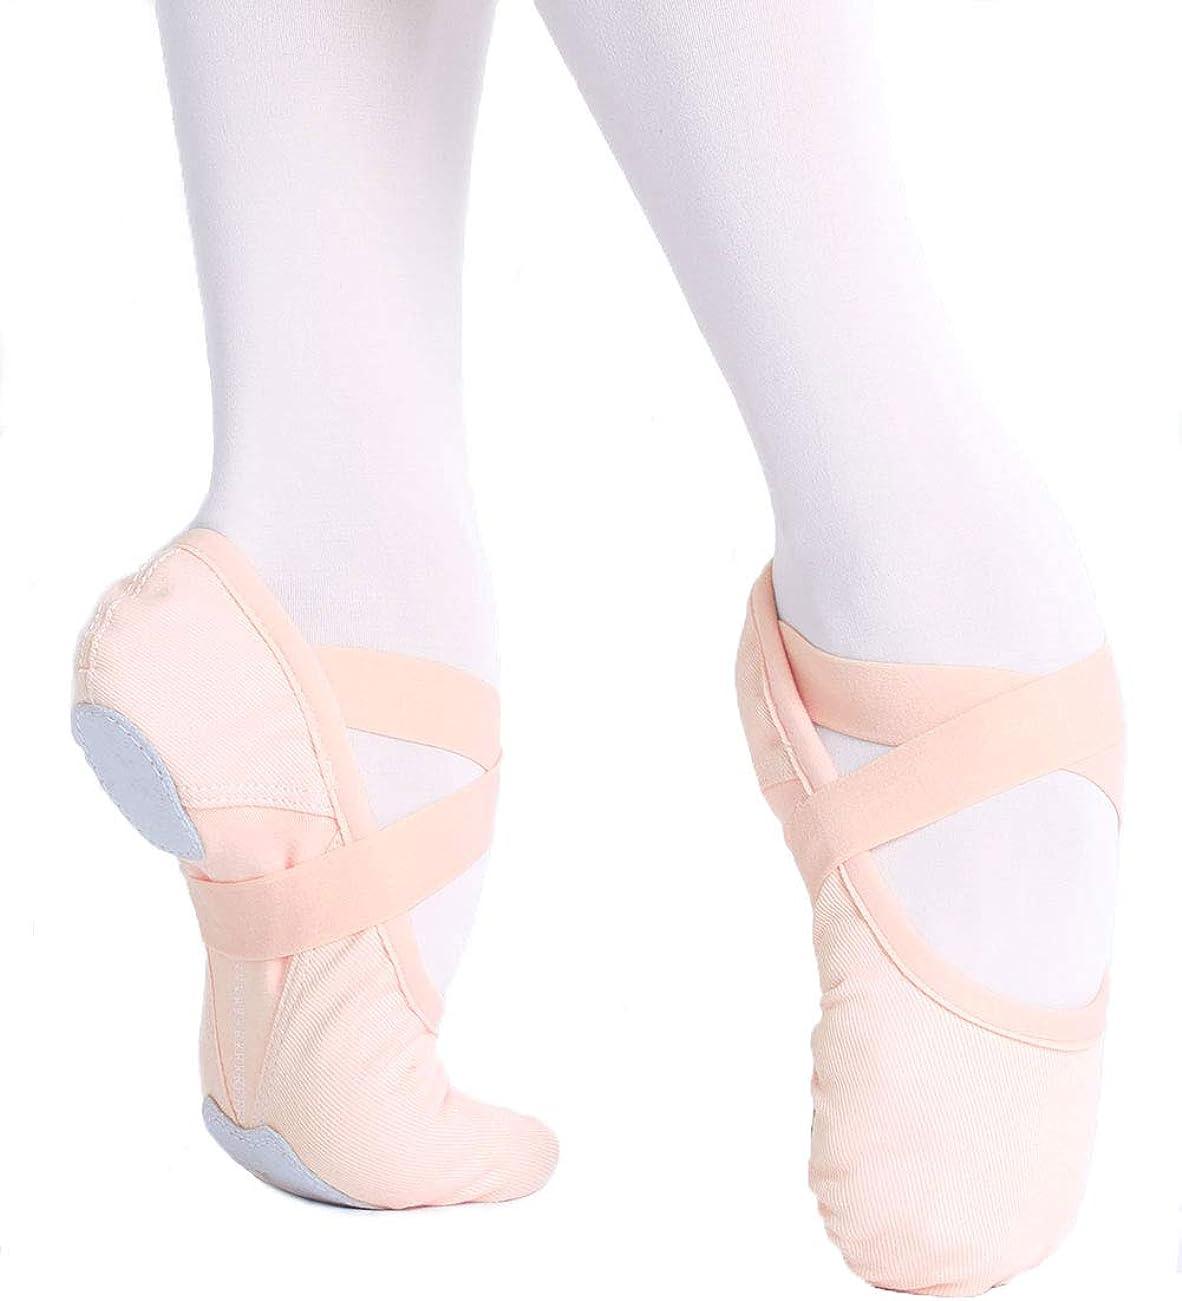 Girls Women Elastic Canvas Ballet Shoes Soft Split Sole Dance Slippers for Gymnastics, Yoga